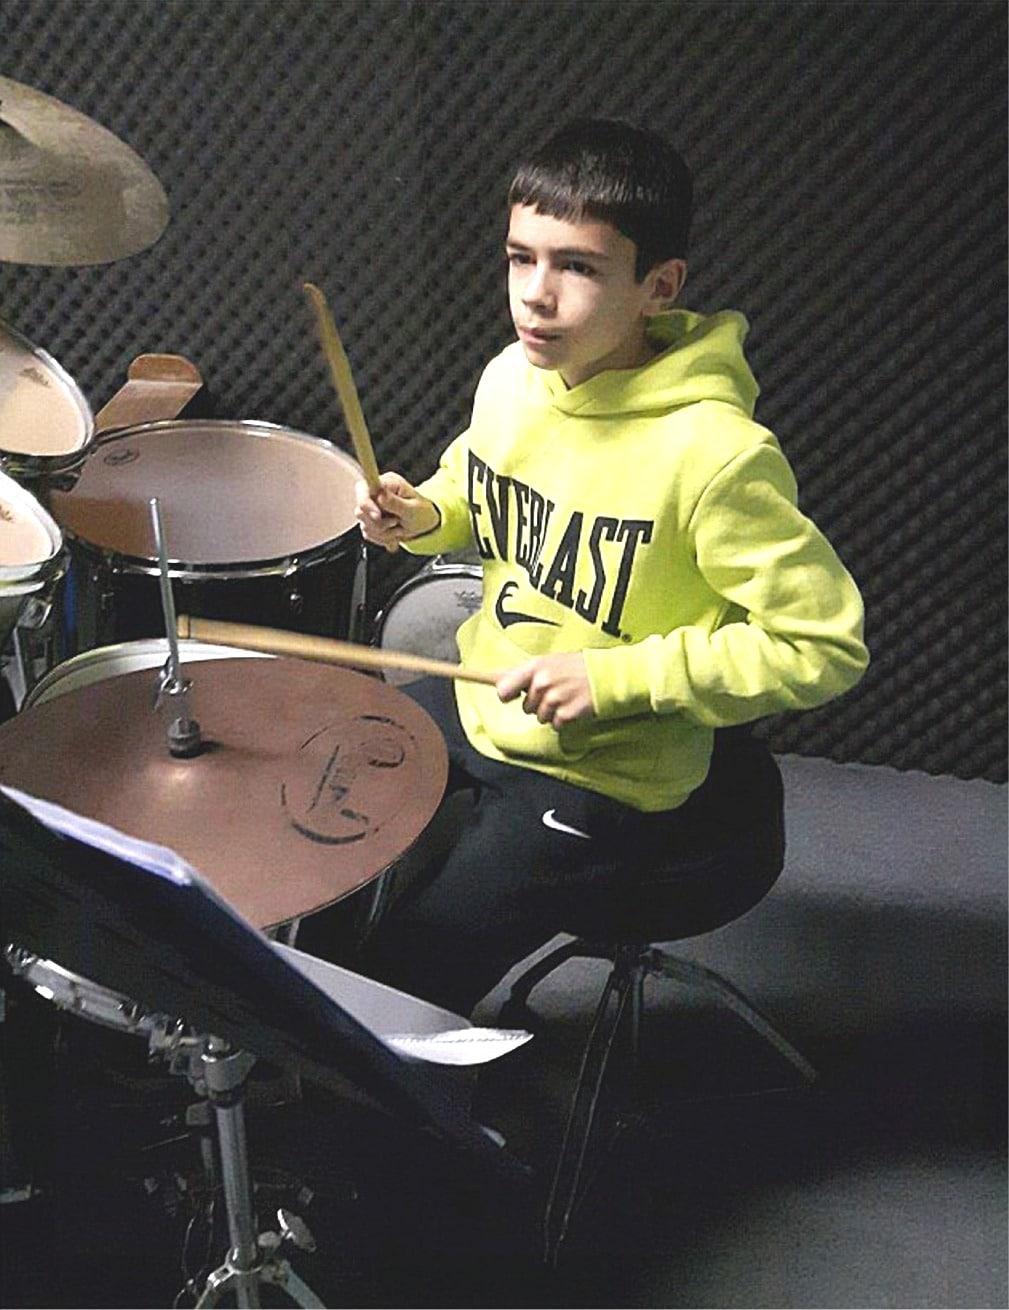 Manfredi Luca